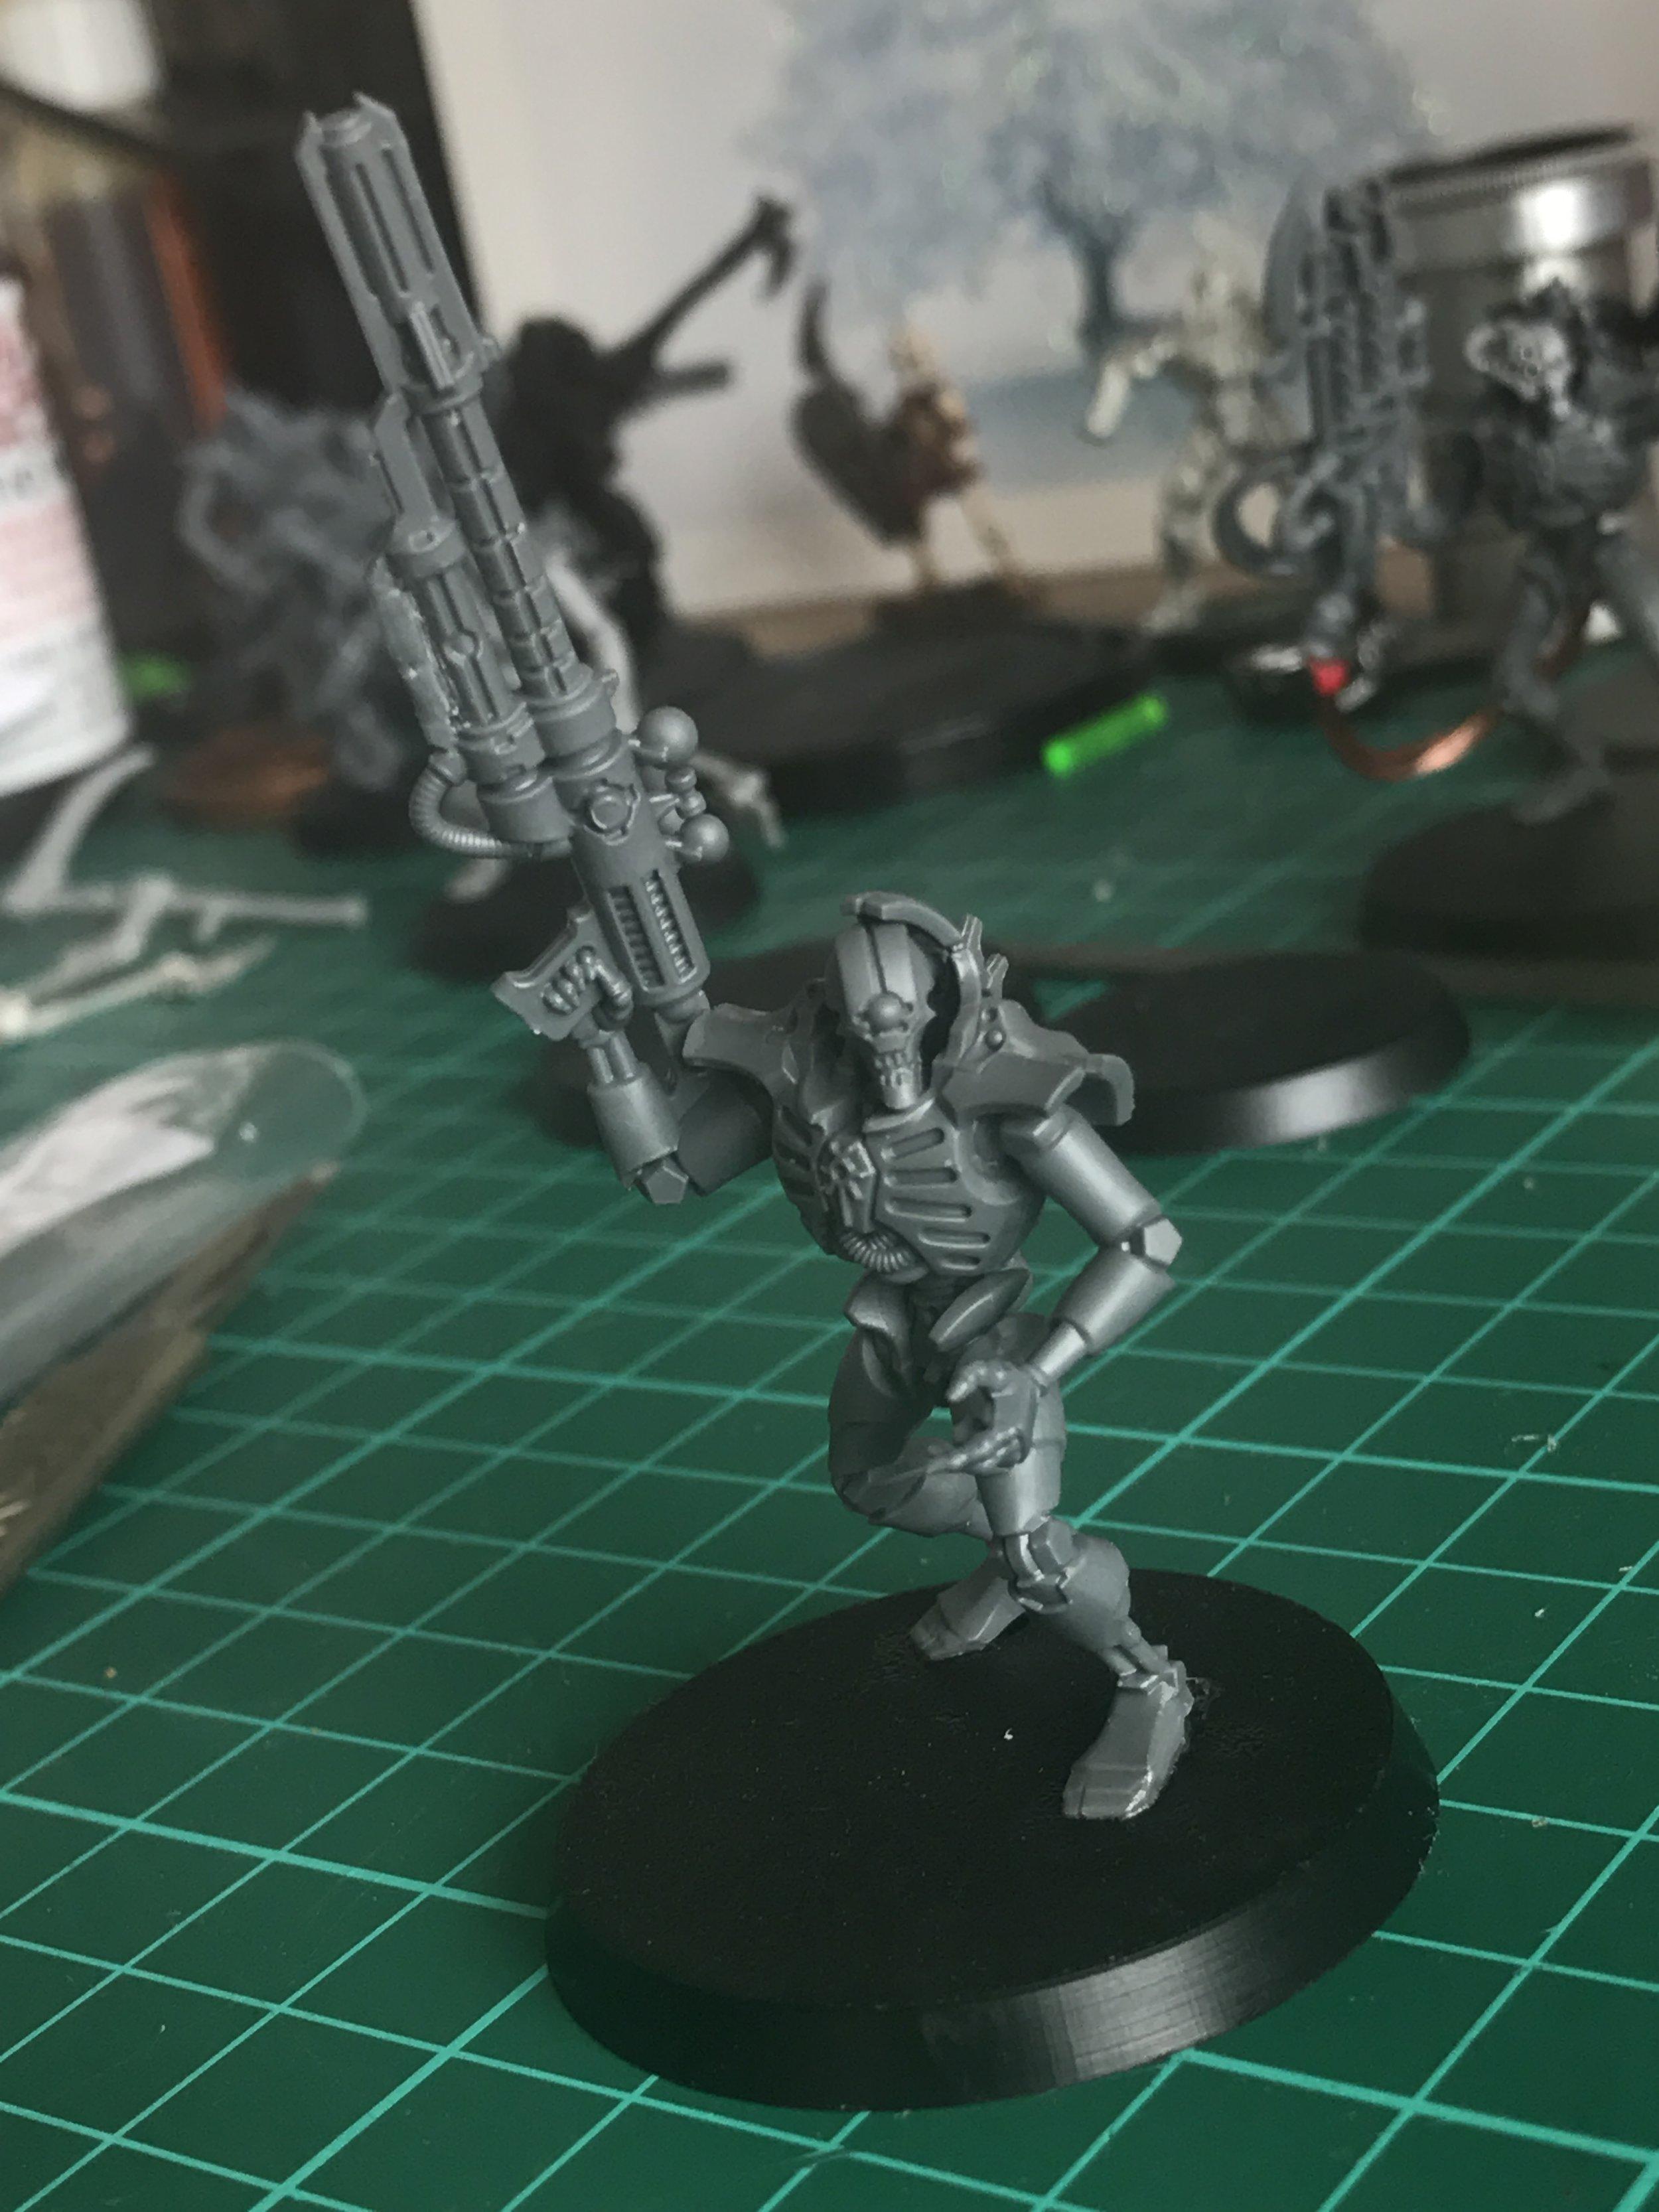 My Deathmark 'Vindicare' Assassin